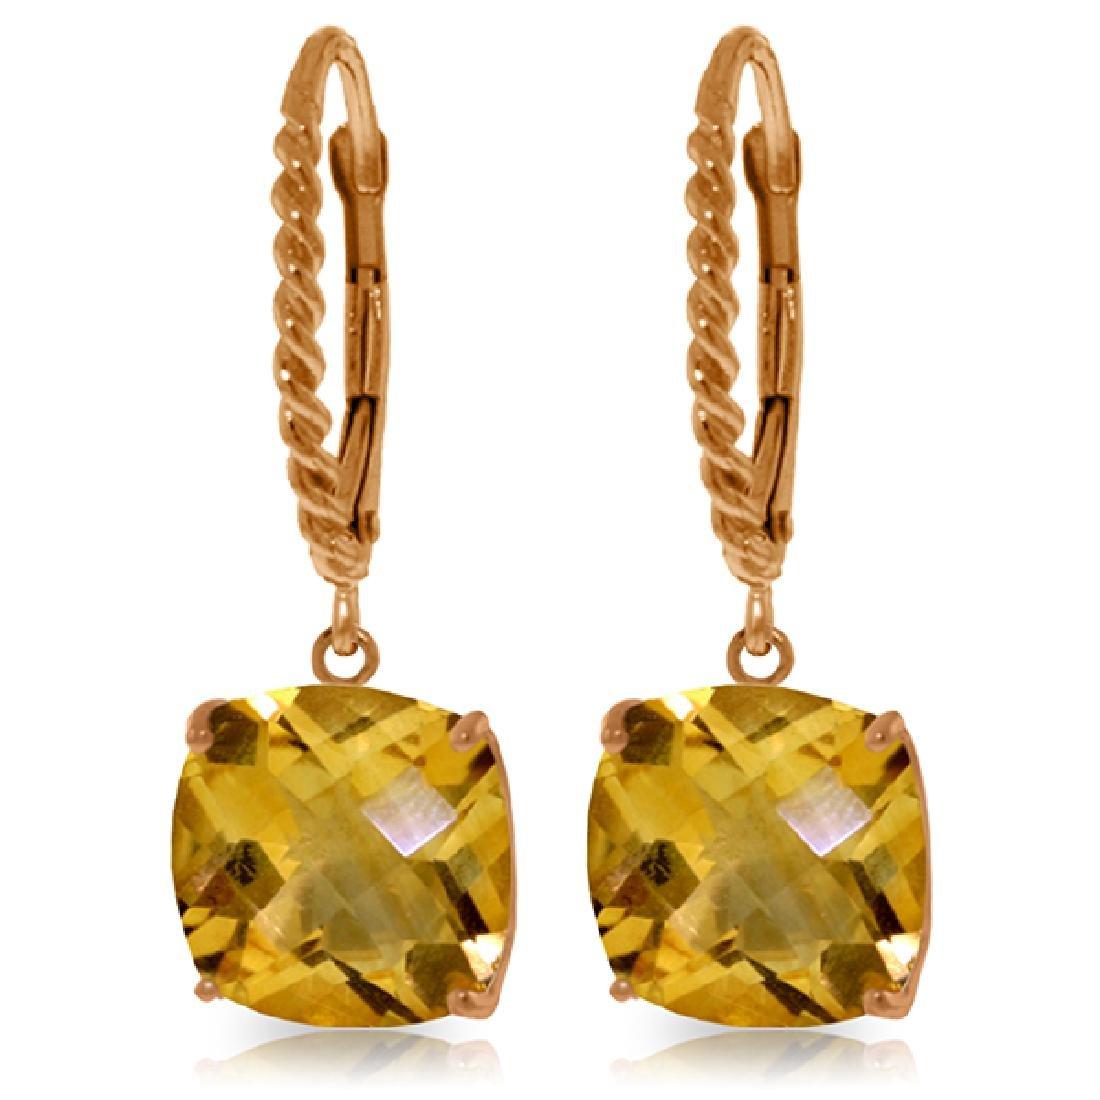 Genuine 7.2 ctw Citrine Earrings Jewelry 14KT Rose Gold